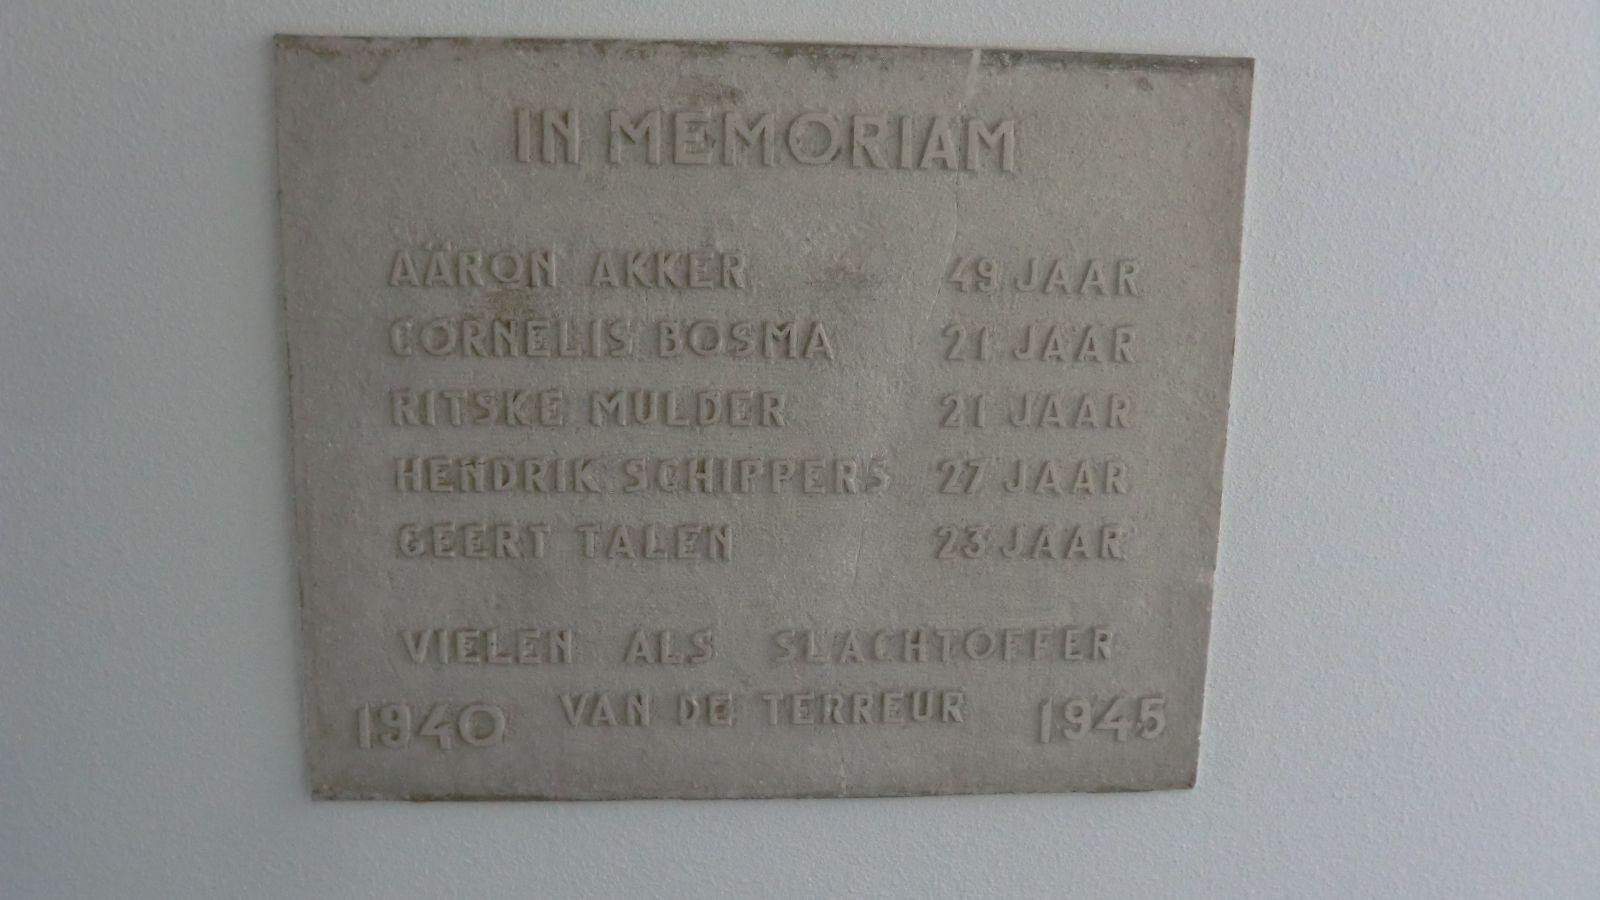 Wolvega, plaquette in de Zuivelfabriek